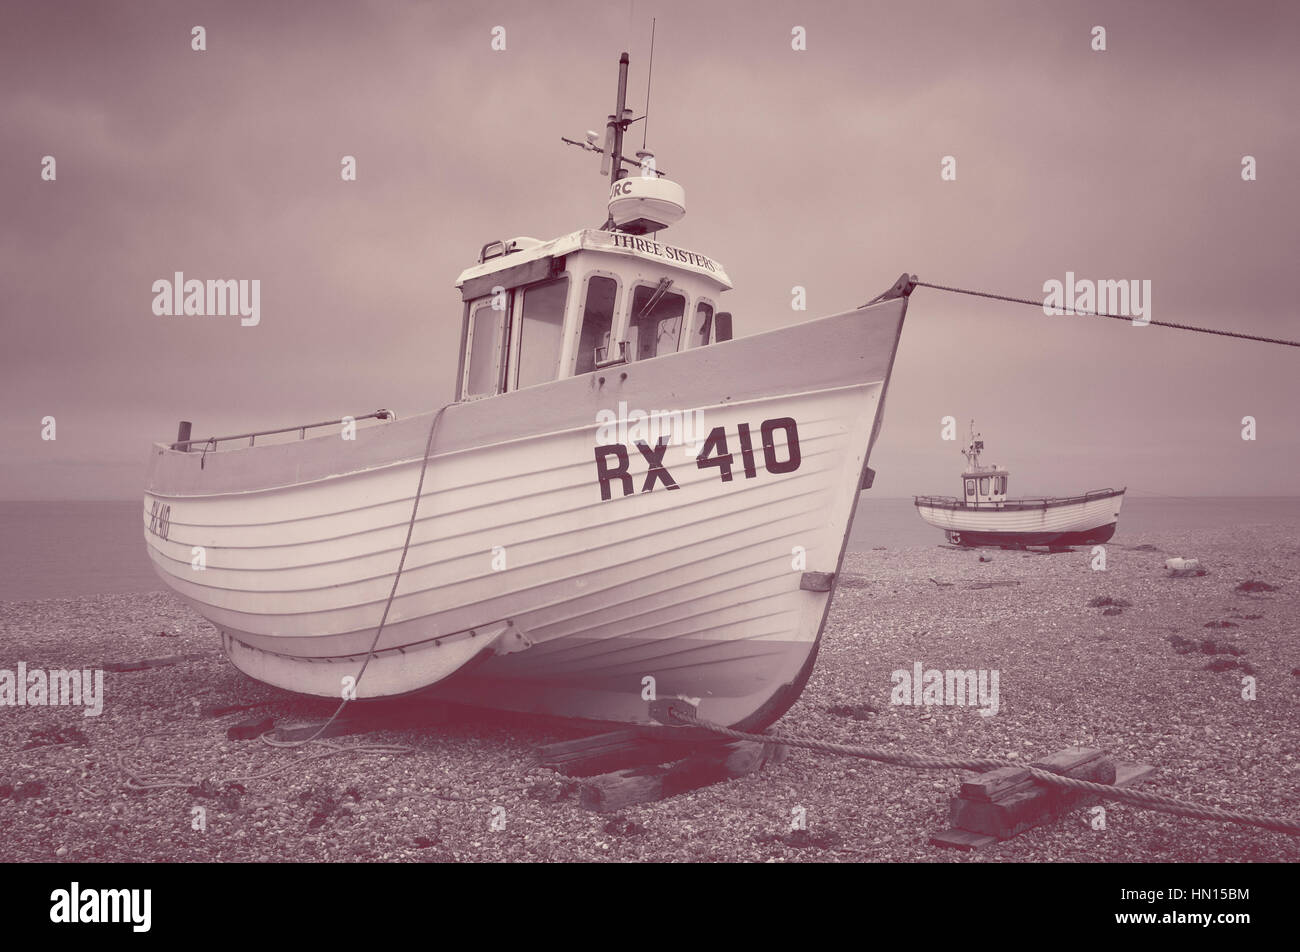 Boats on the shingle beach at Dungeness, Kent, England, UK - Stock Image